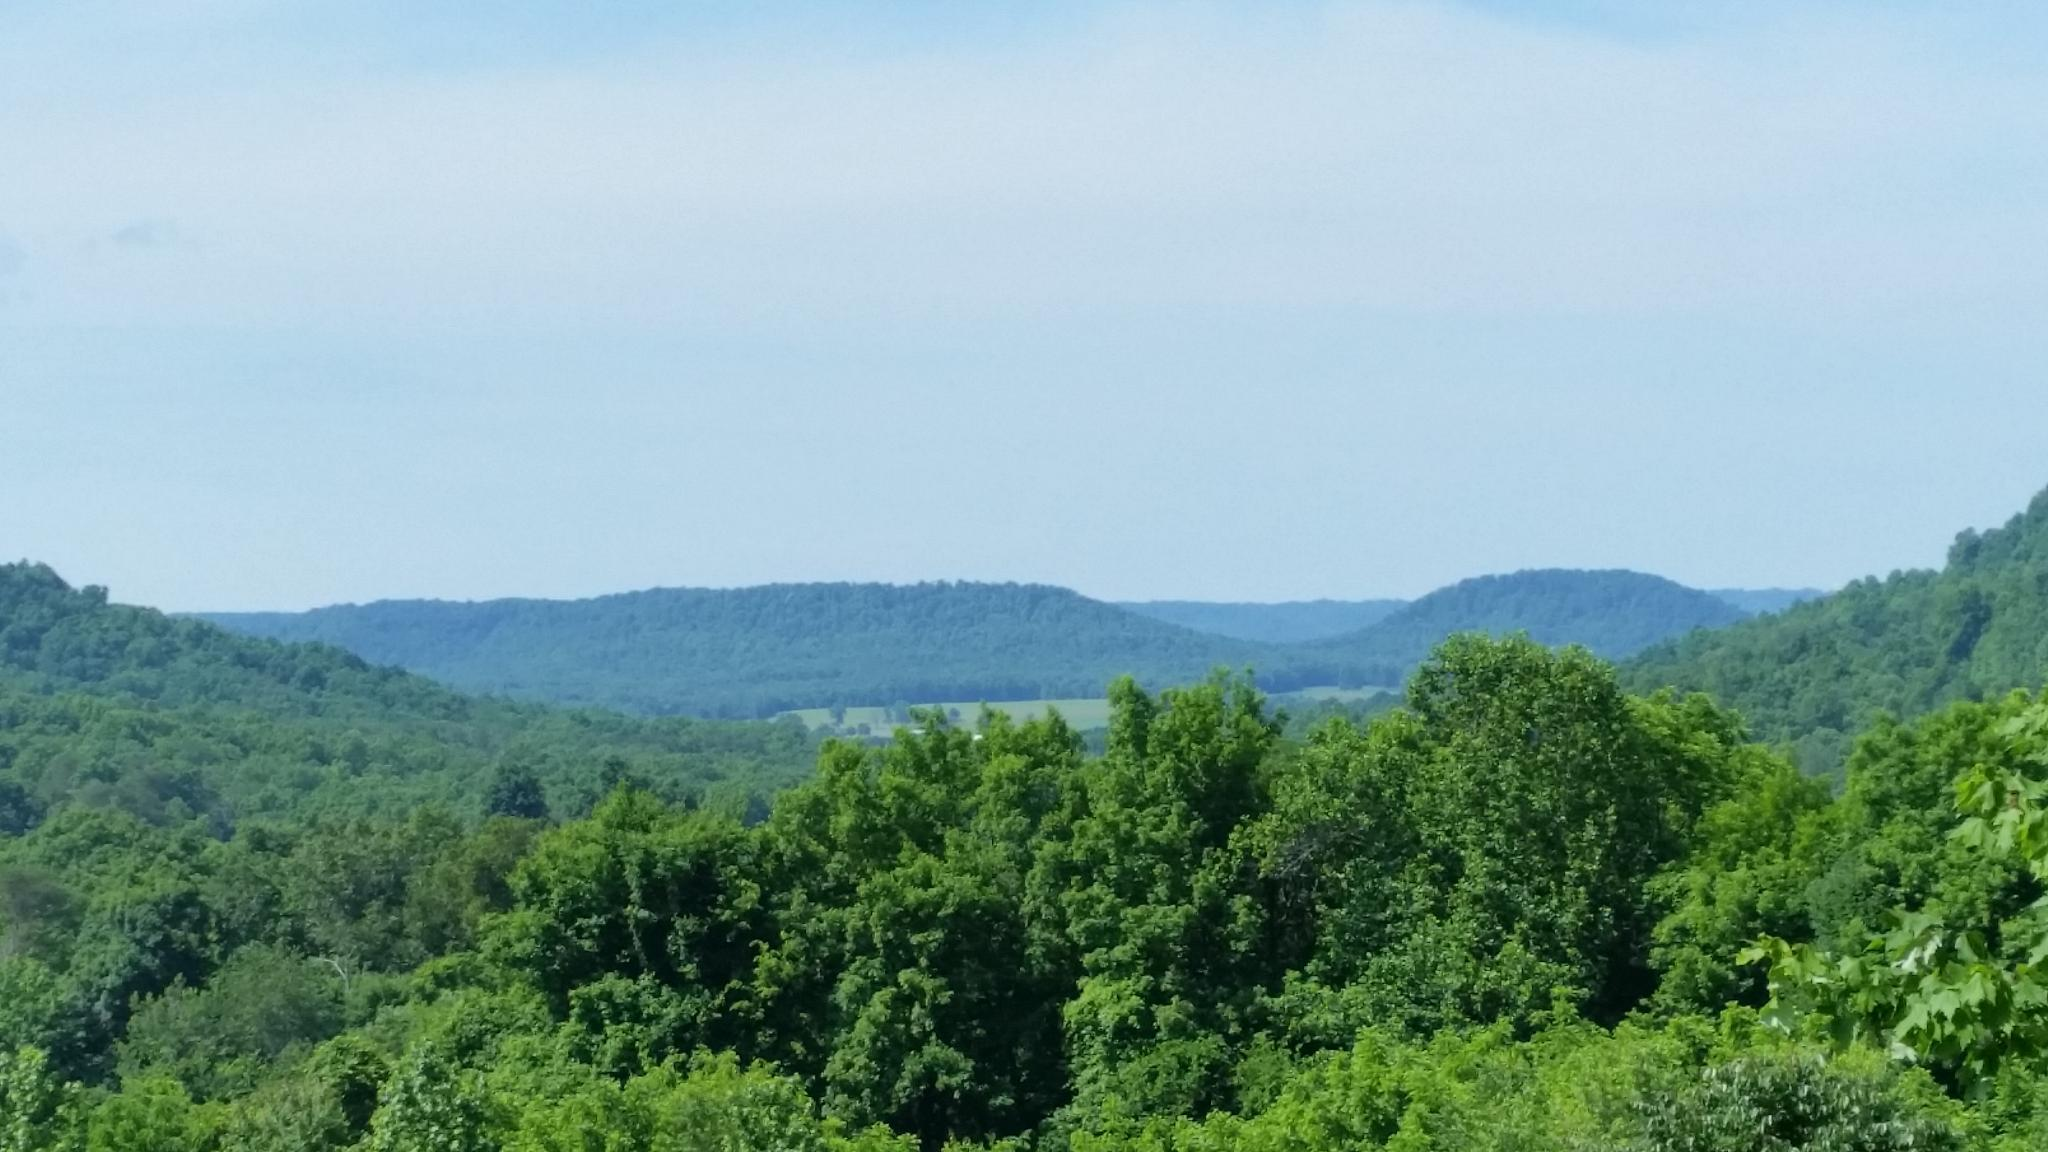 Mountain View of Campbellsville, Kentucky by Quentin den Braber